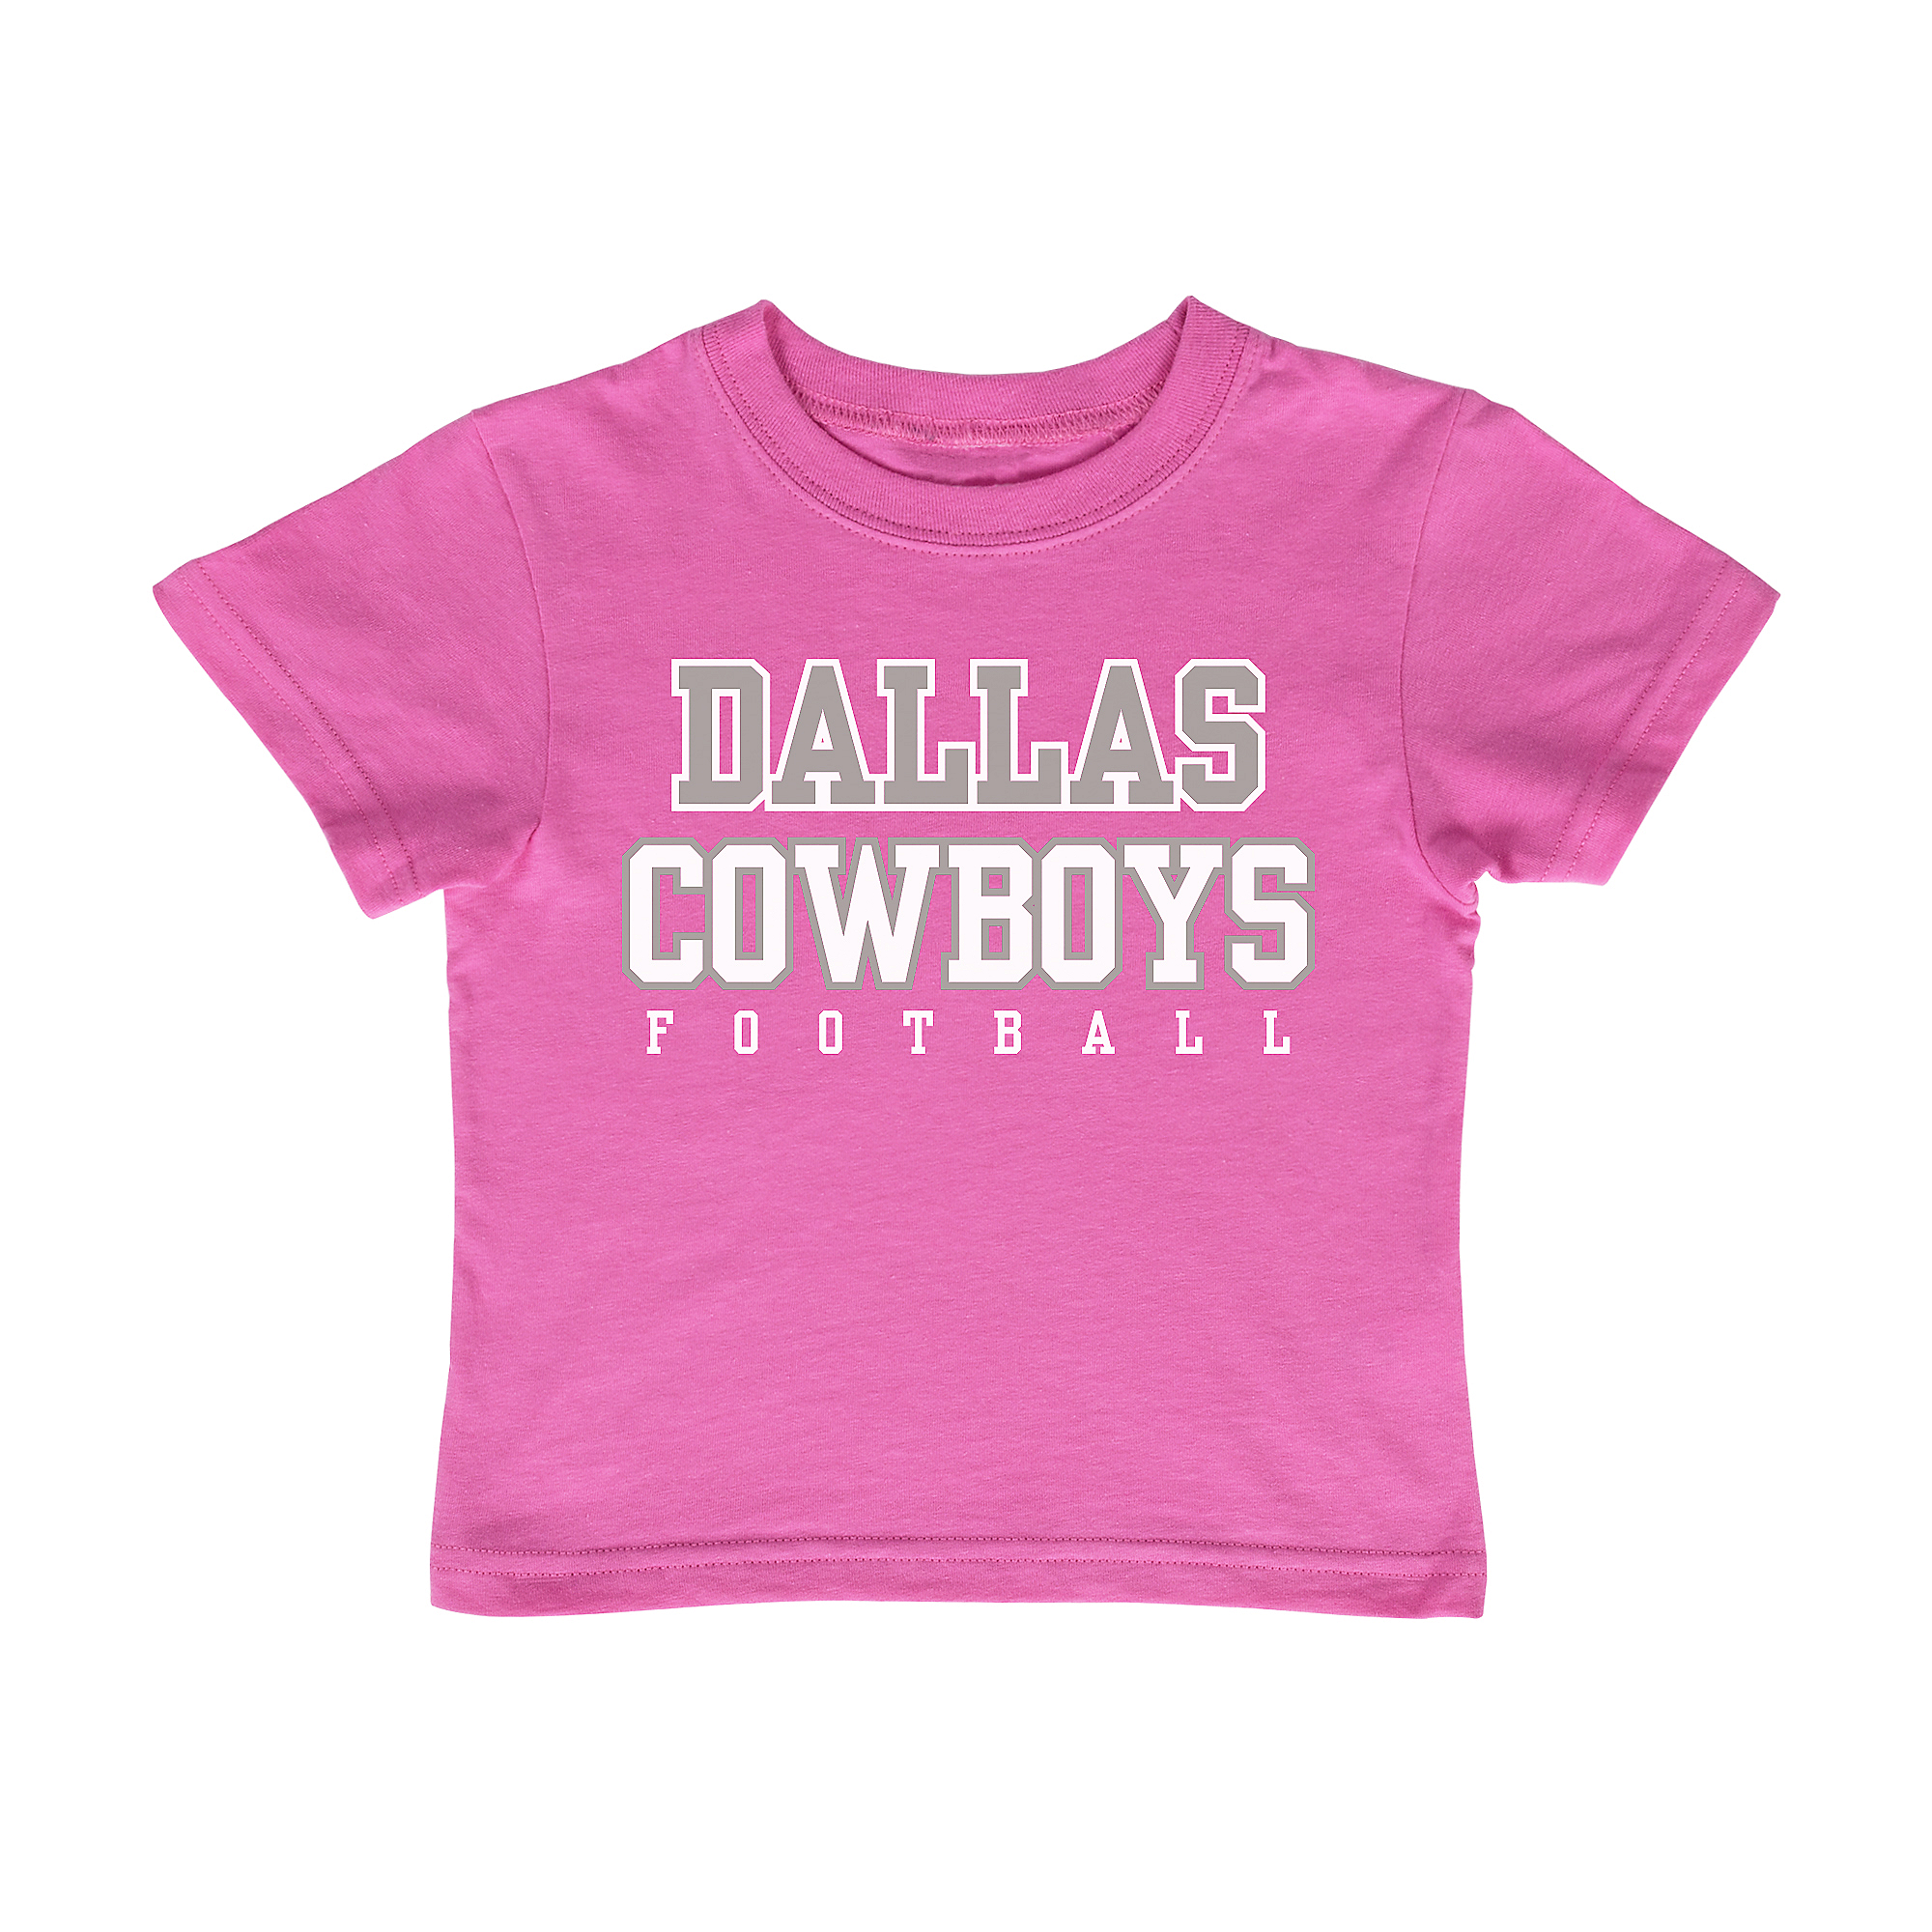 Dallas Cowboys Toddler Practice Tee